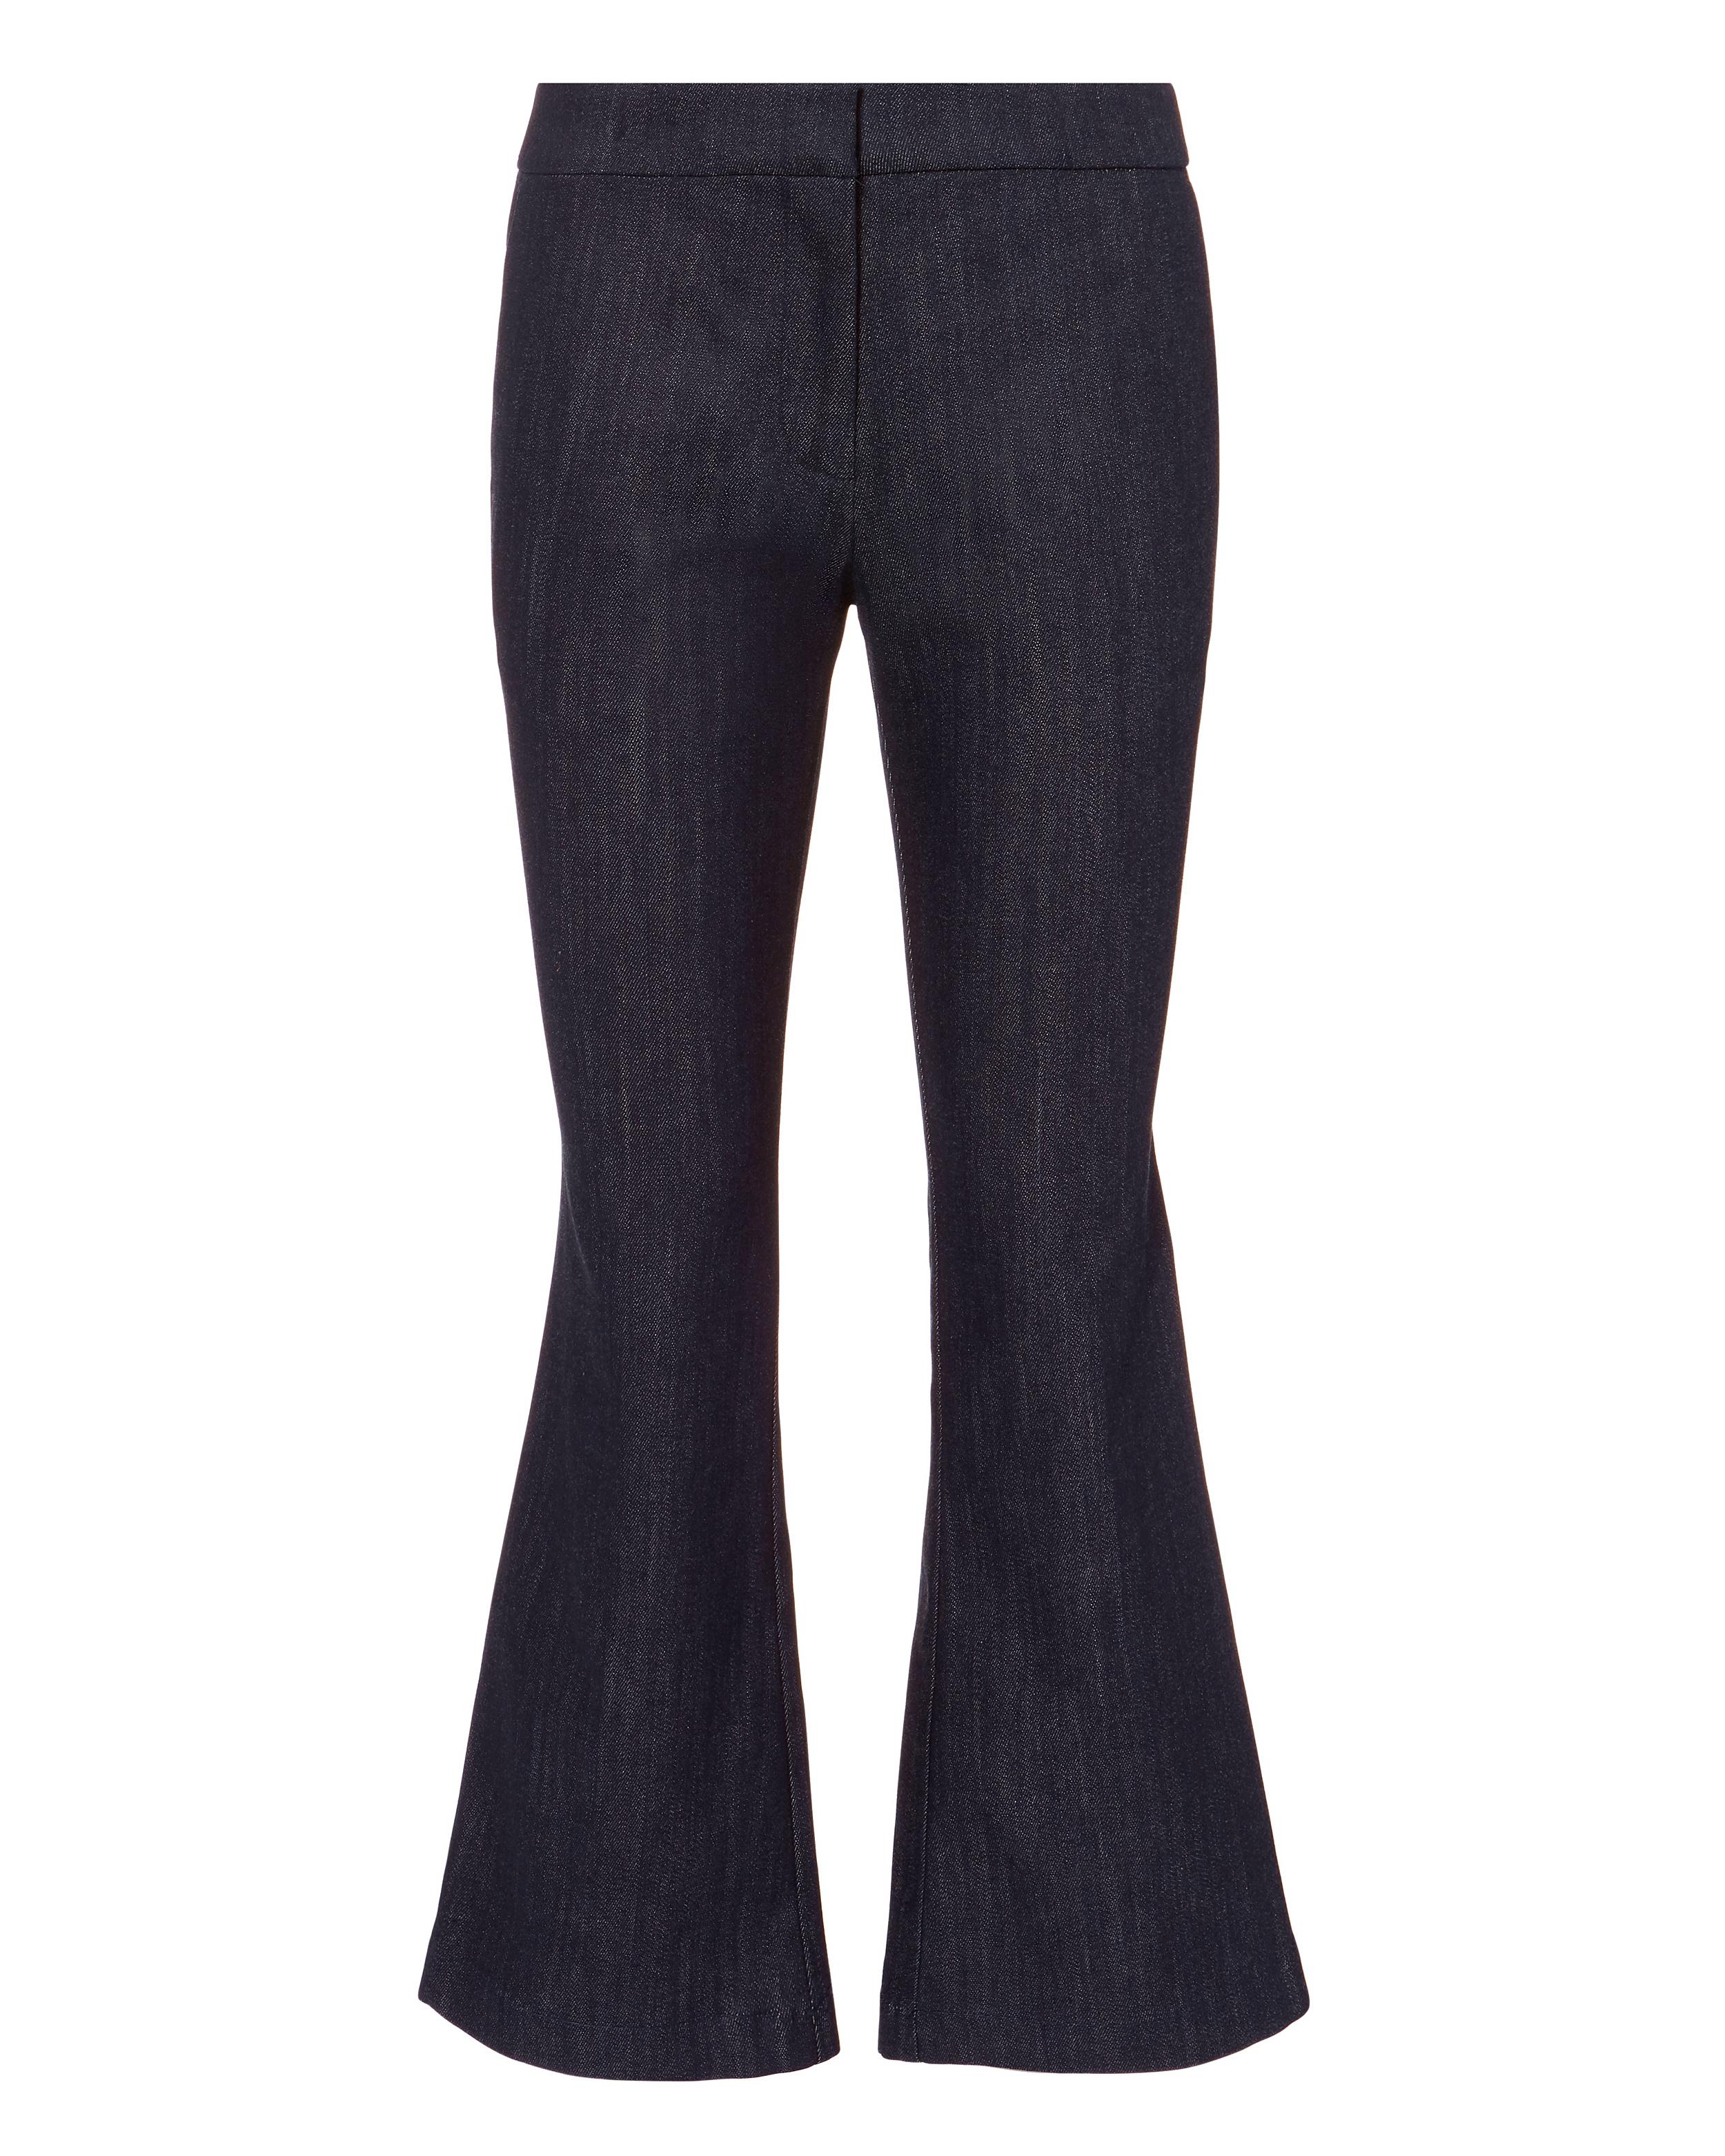 10 CROSBY Denim Crop Flare Trousers